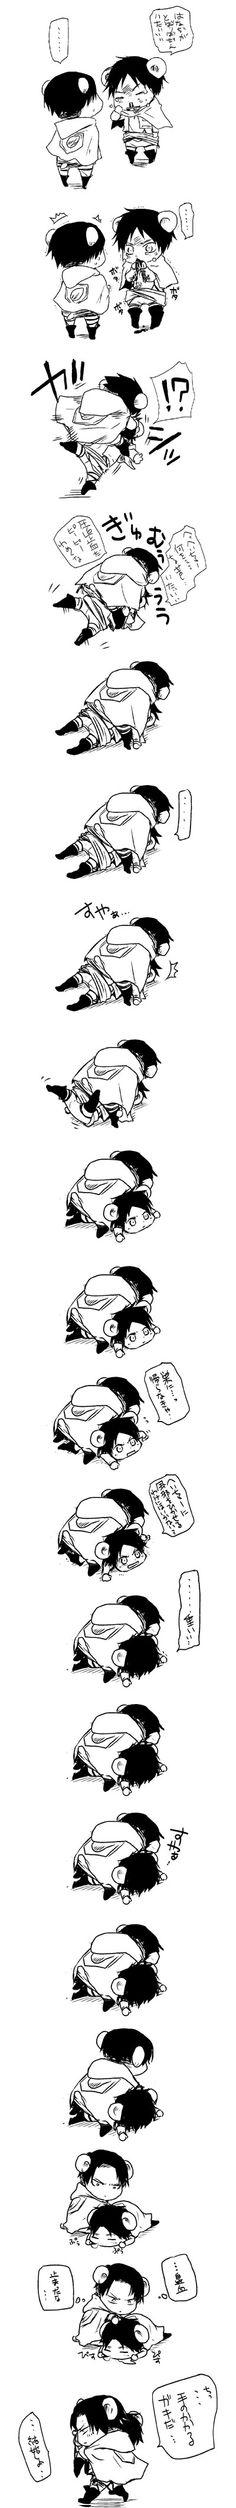 Levi and Eren || AoT